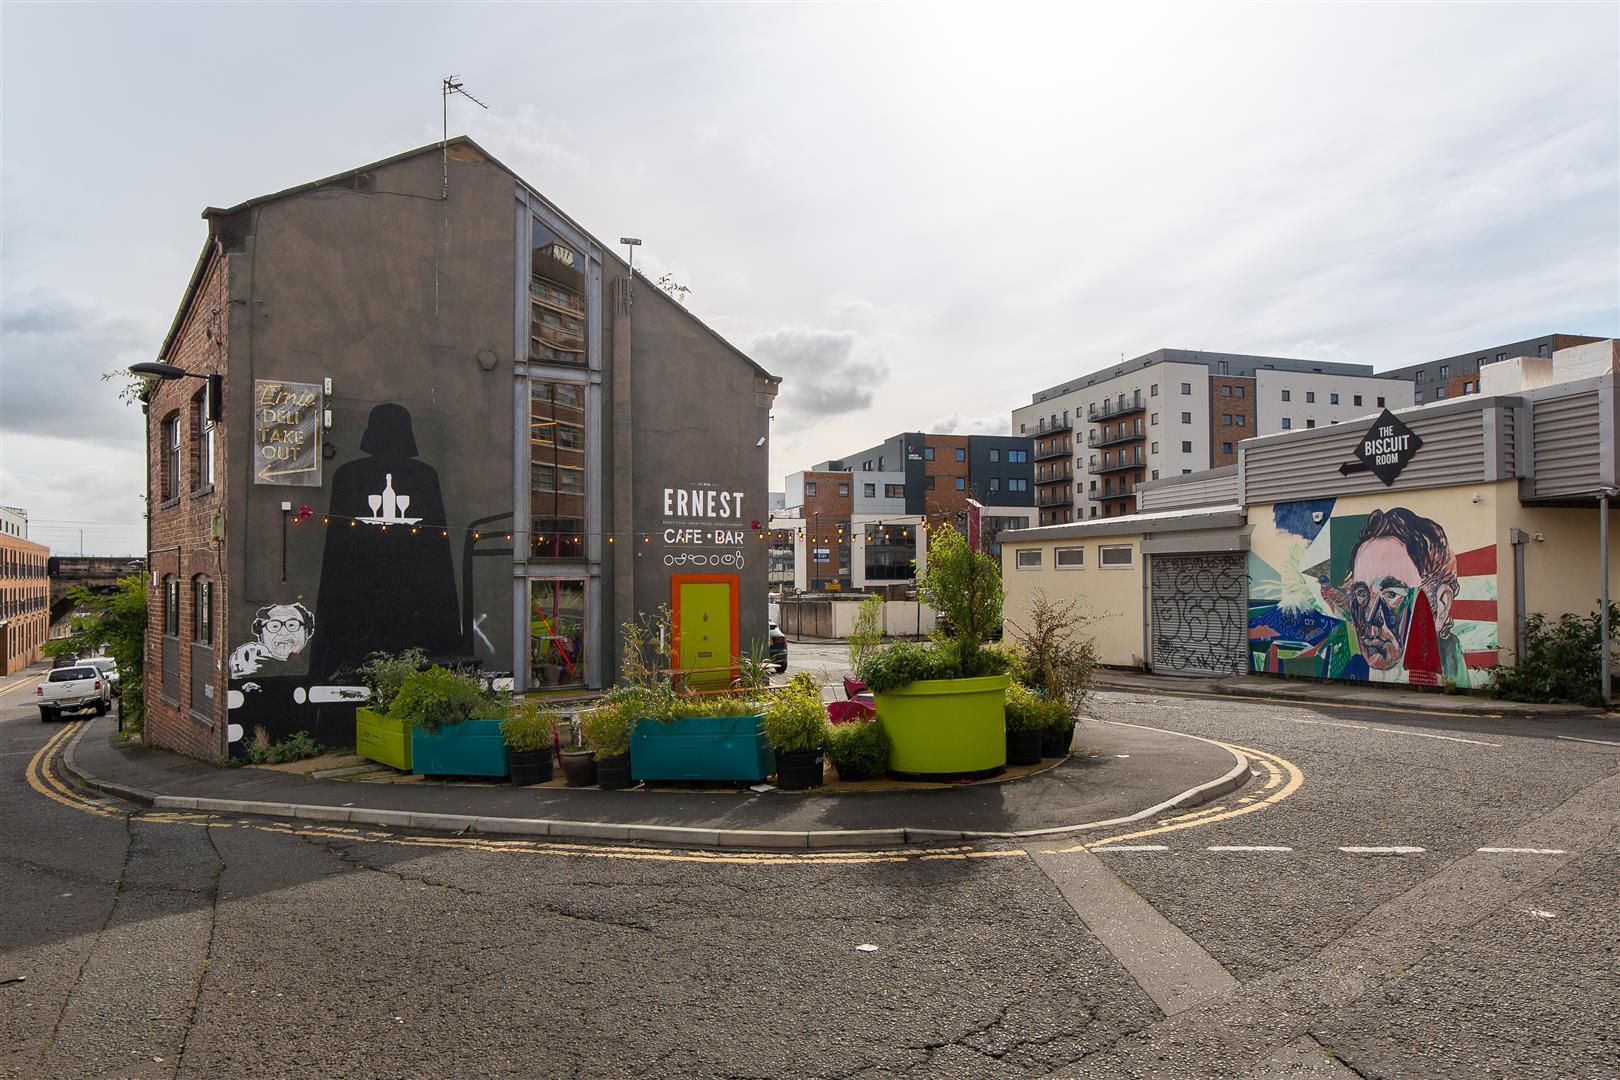 1 bed studio flat to rent in Newcastle Upon Tyne, NE2 1BP, NE2